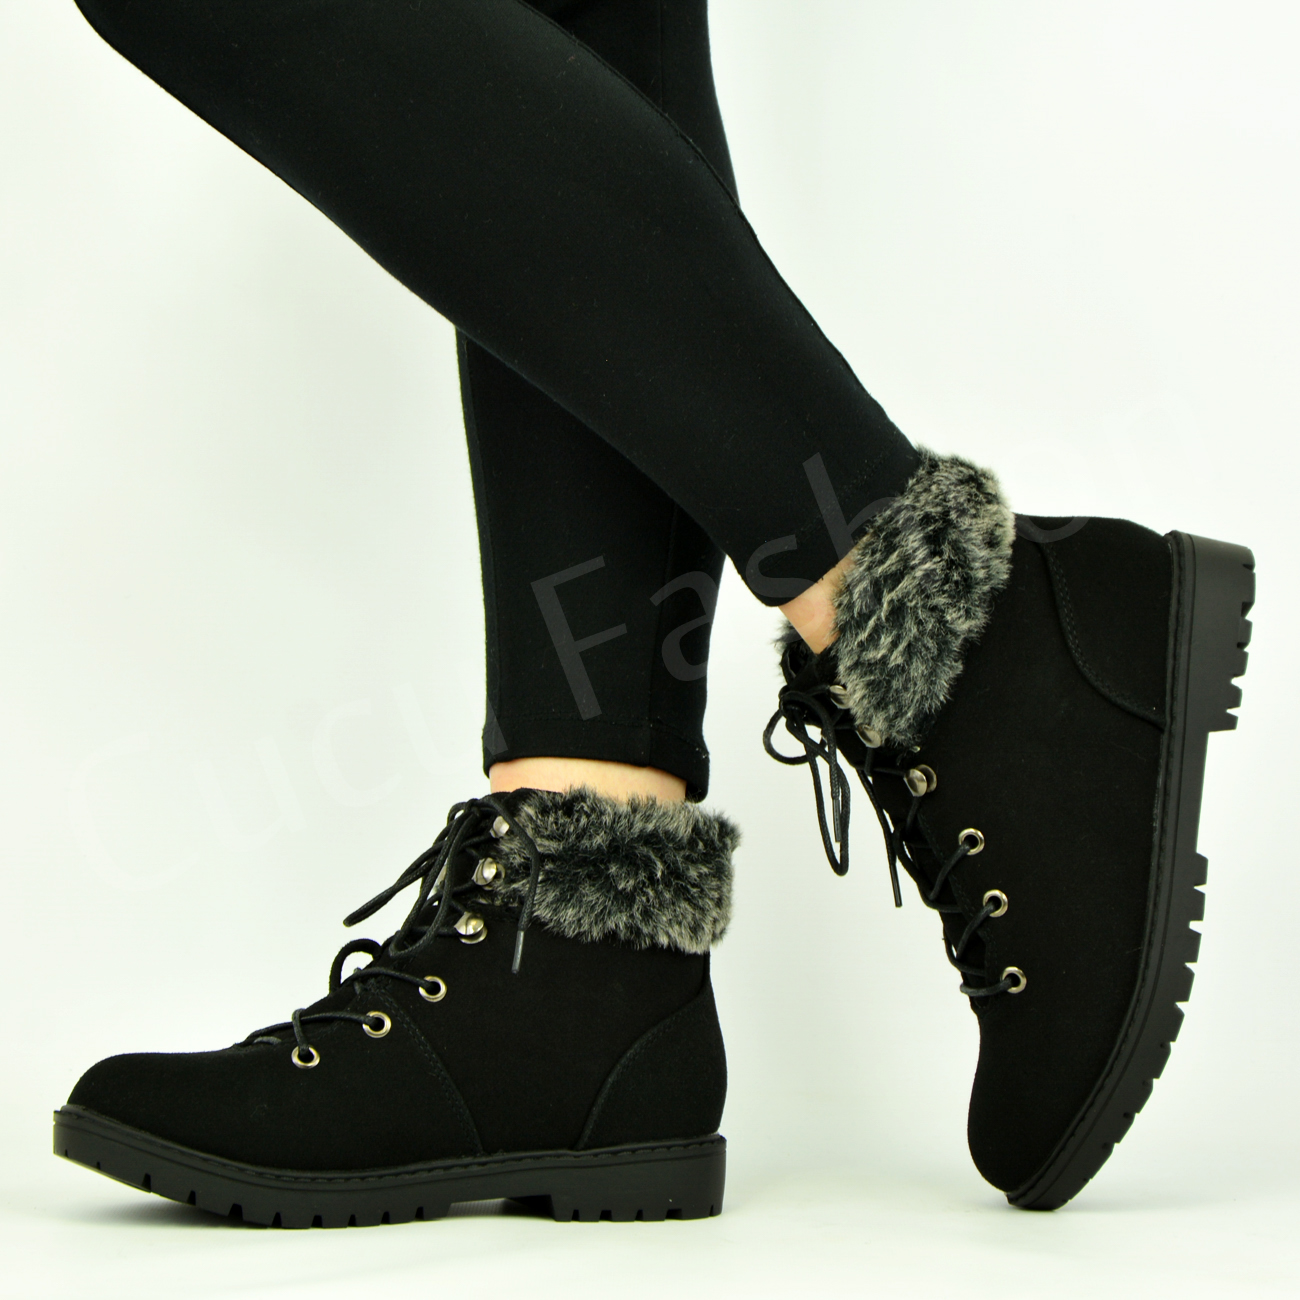 Original Womens NorthWest WaterProof Leather Lace Up Walking Hiking Boots UK Sizes 3 To 8 | EBay